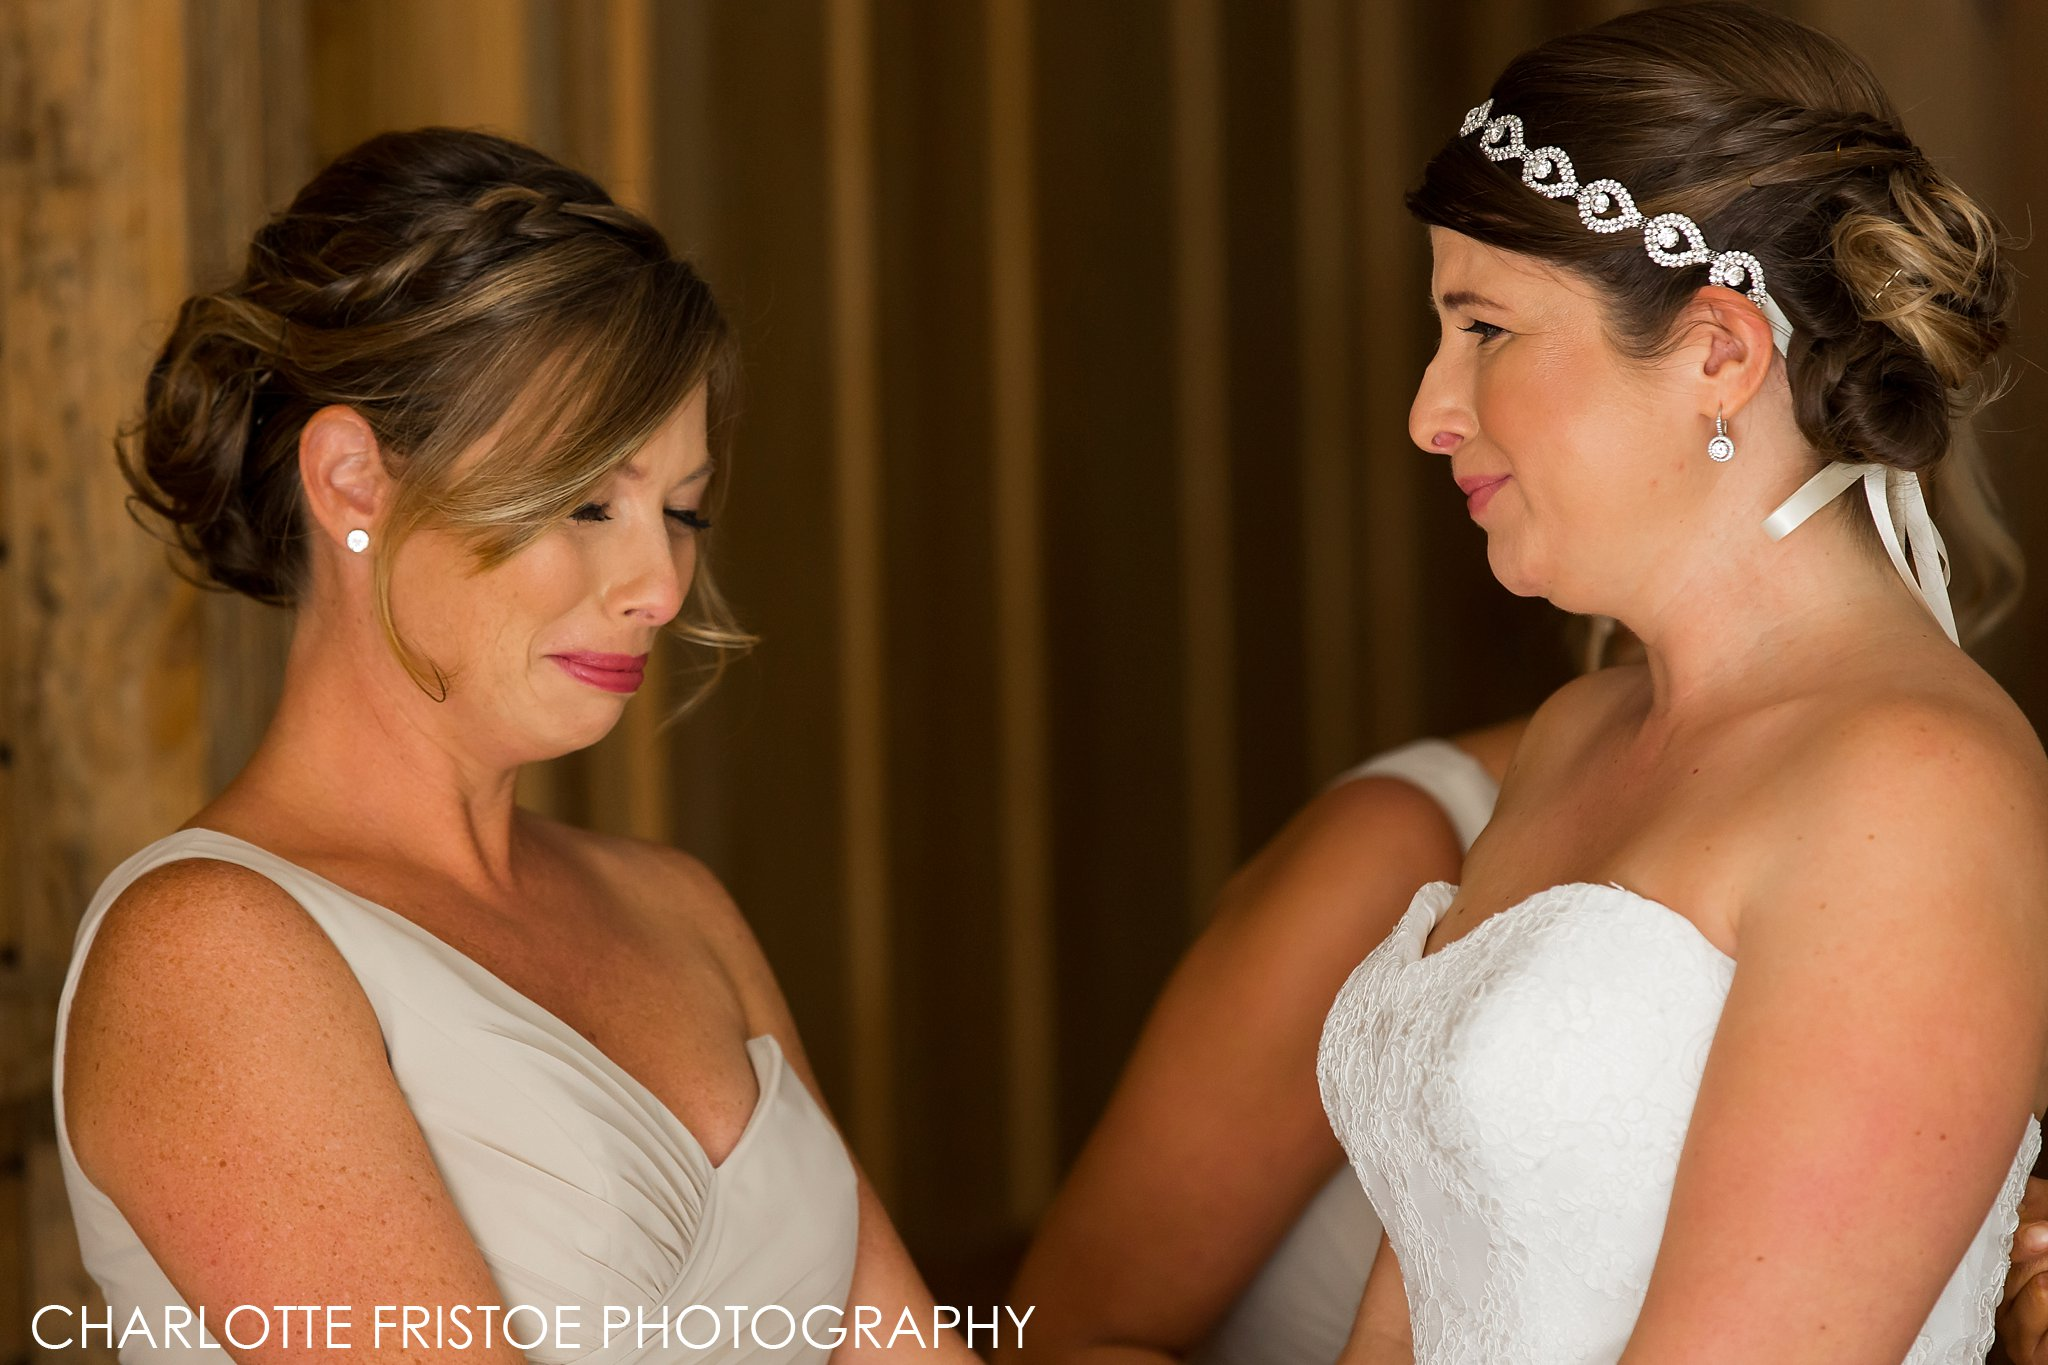 Charlotte Fristoe Photography Blog-9.jpg